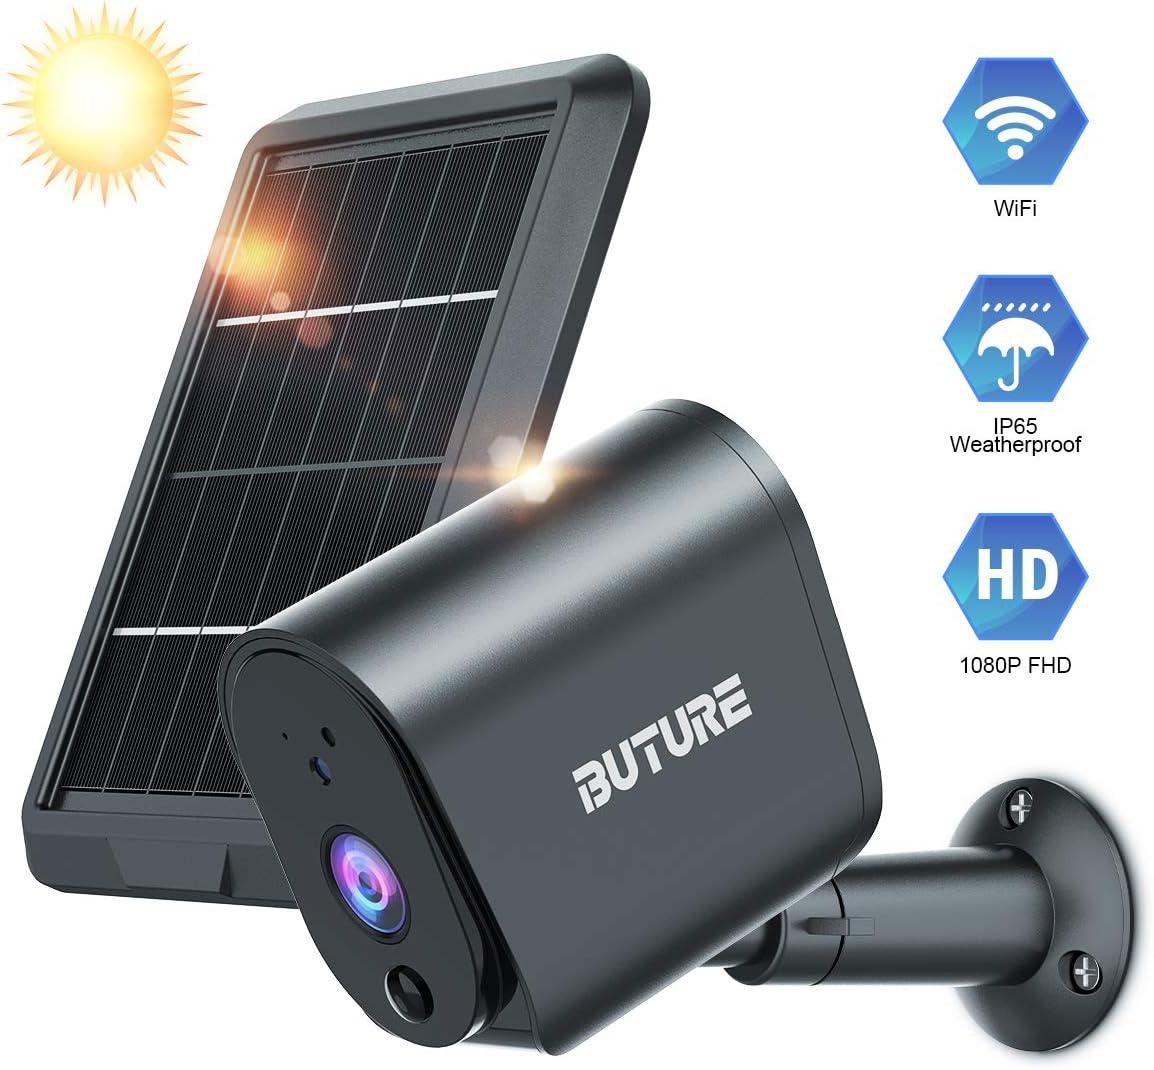 BuTure Security Camera Outdoor